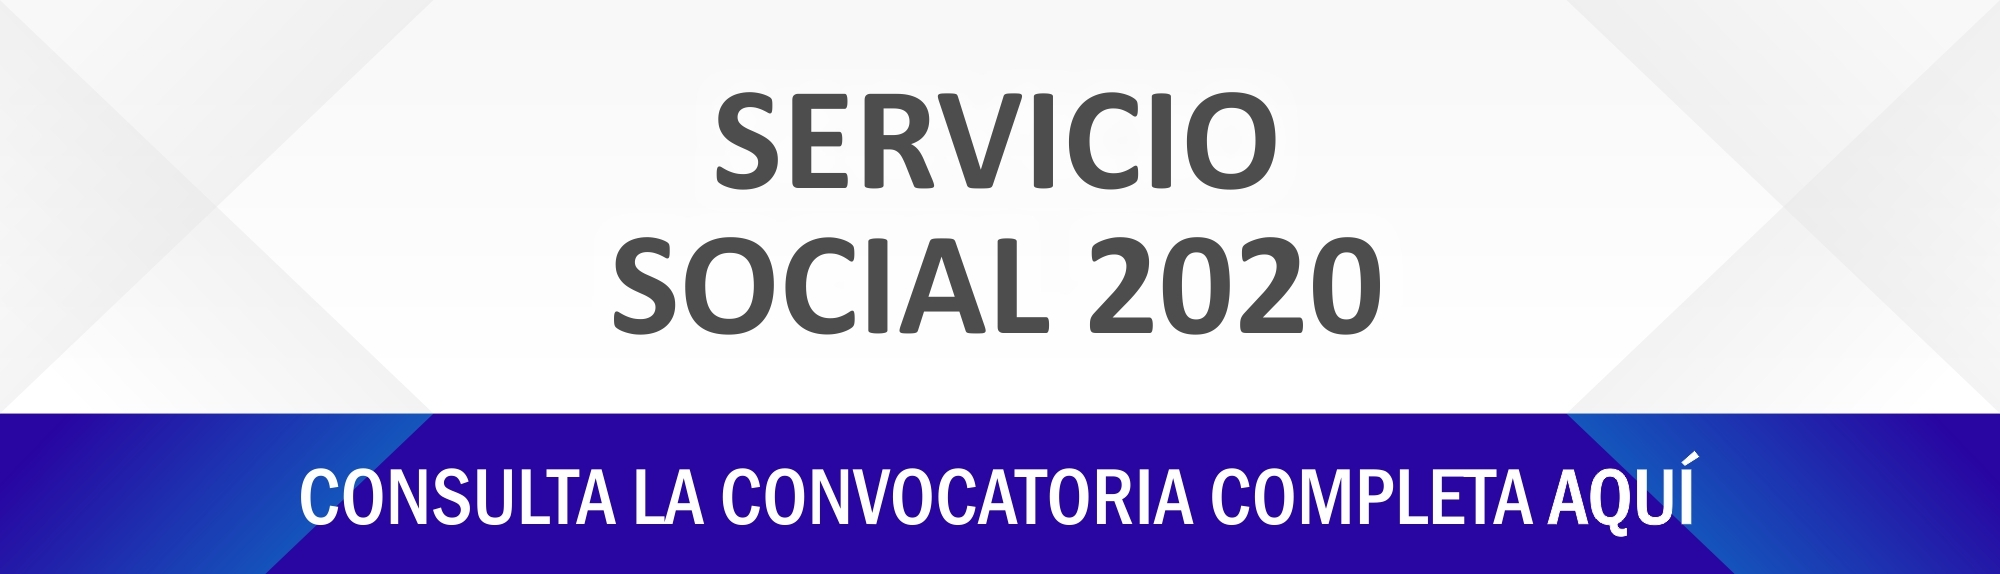 Convocatoria Servicio Social agosto – diciembre 2020